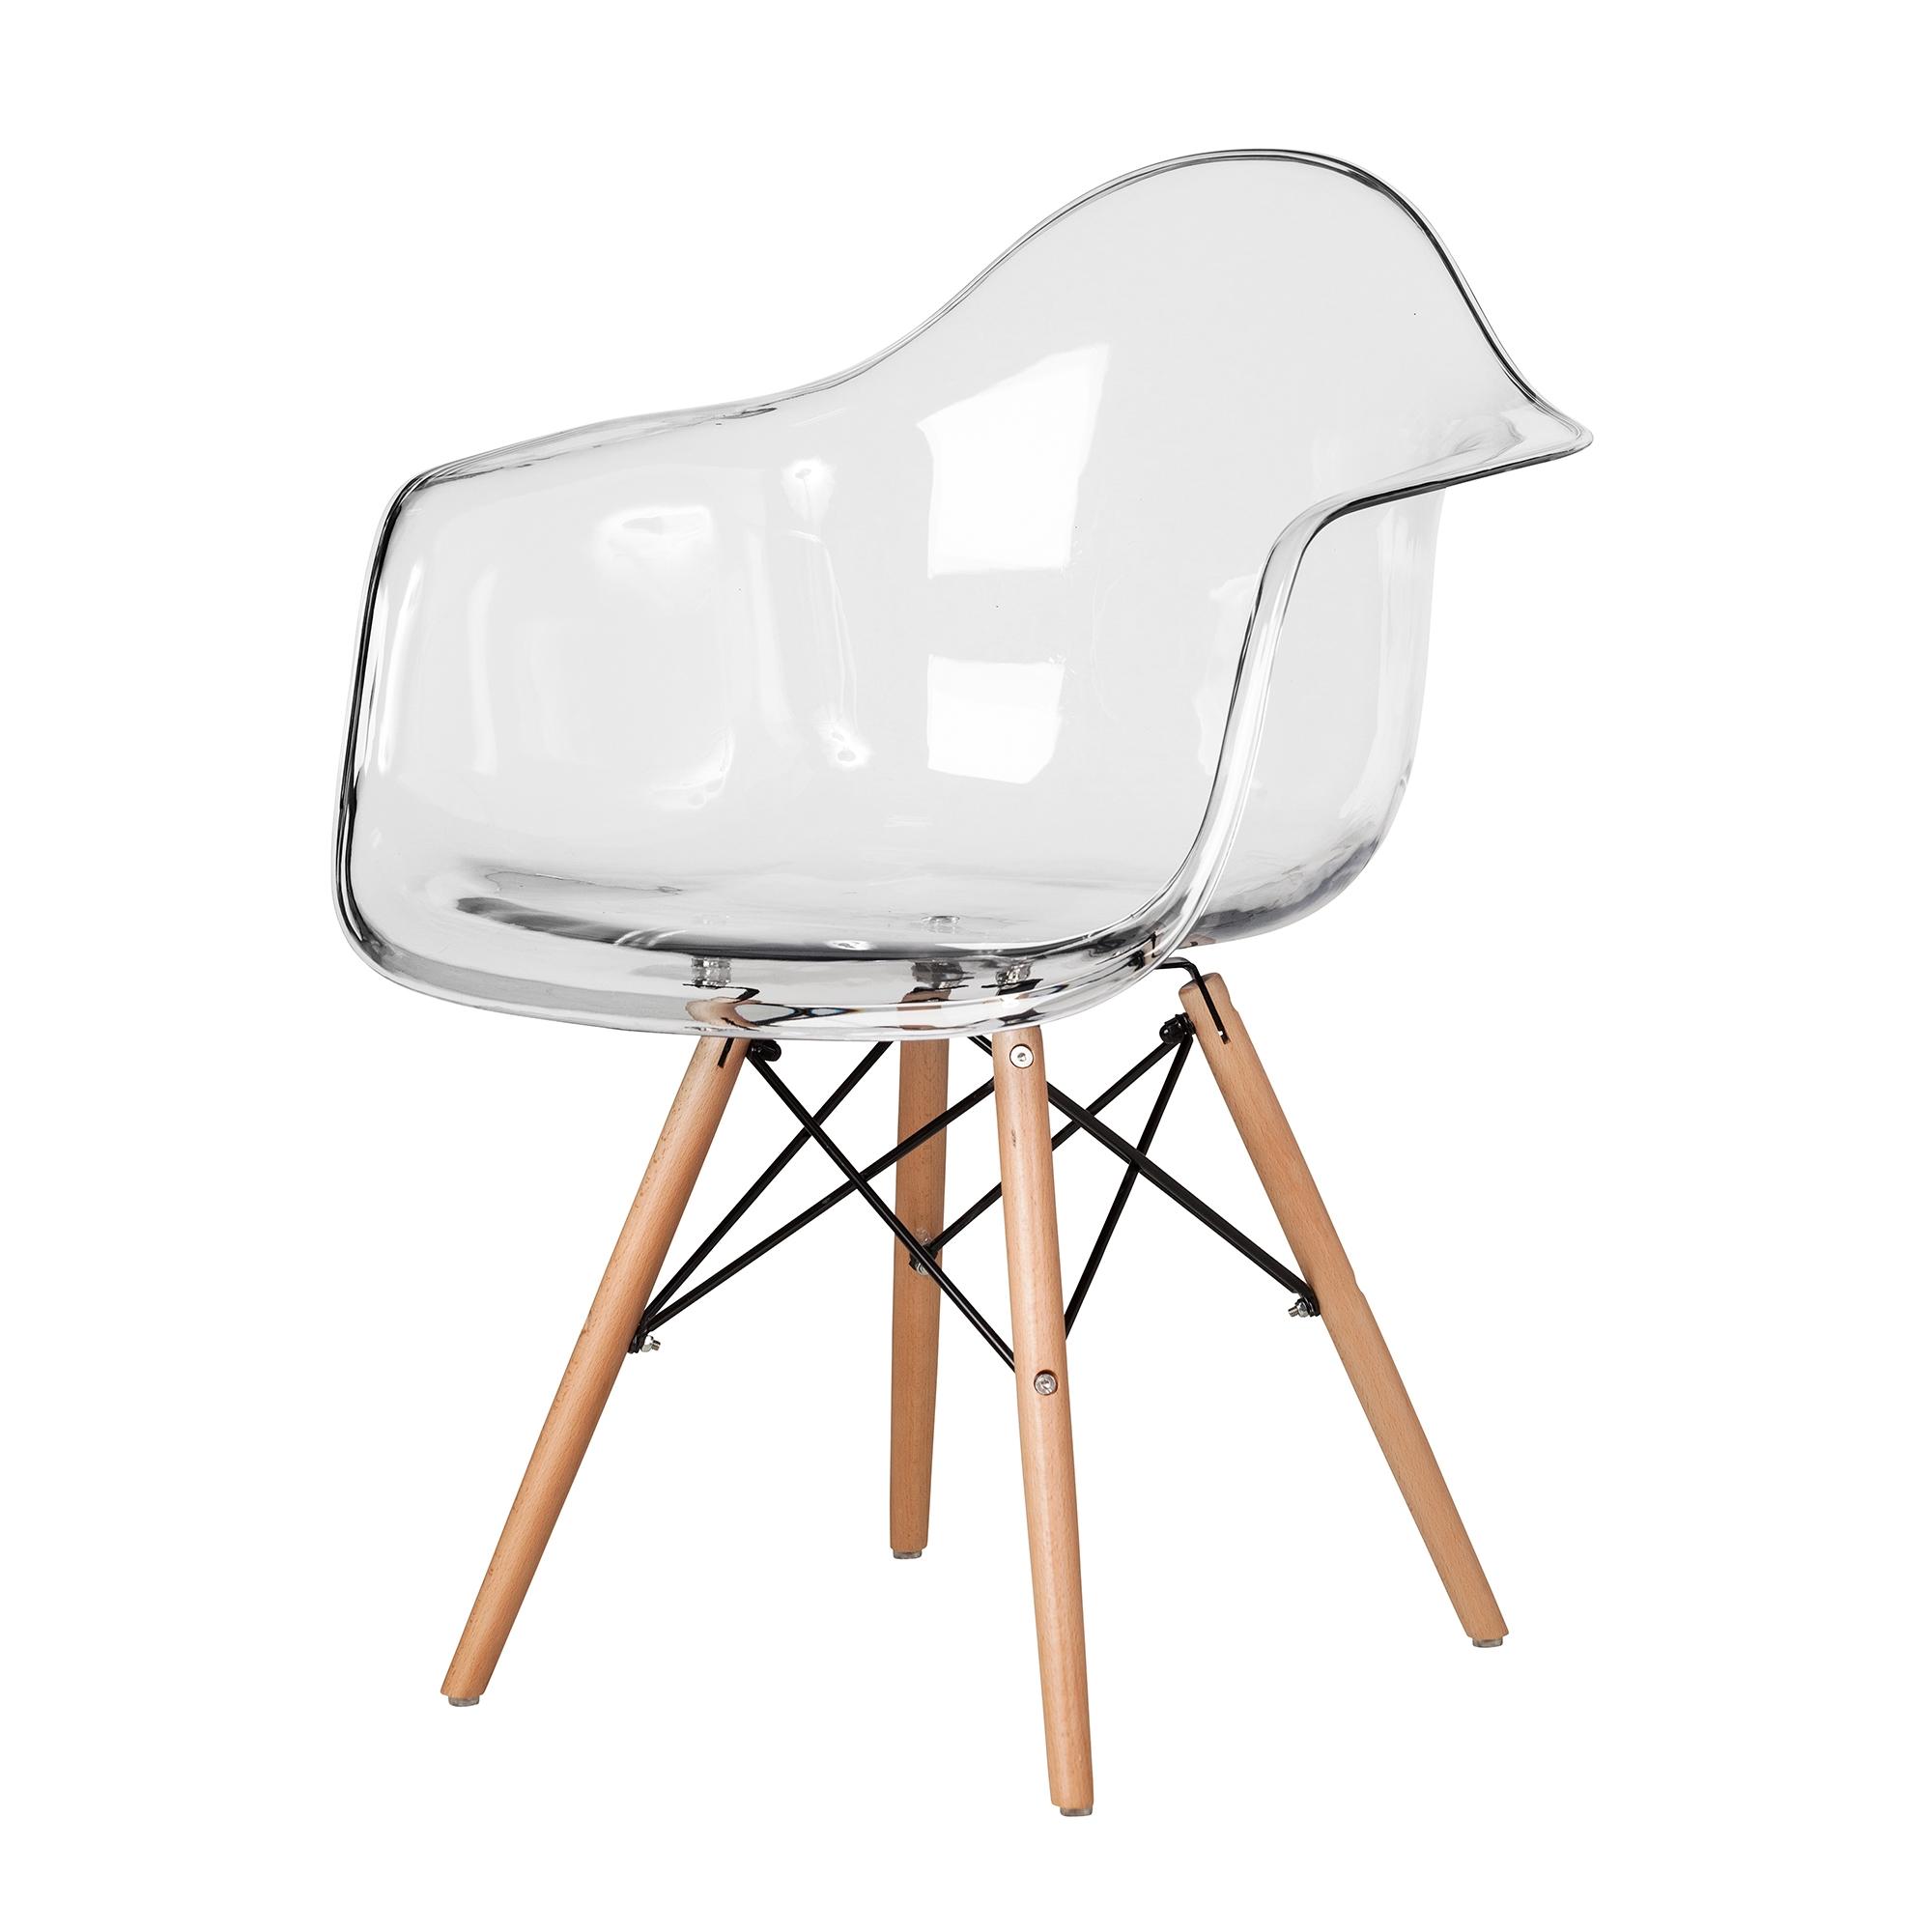 eames arm chair beauty salon chairs kitchen clear the khazana home austin furniture store